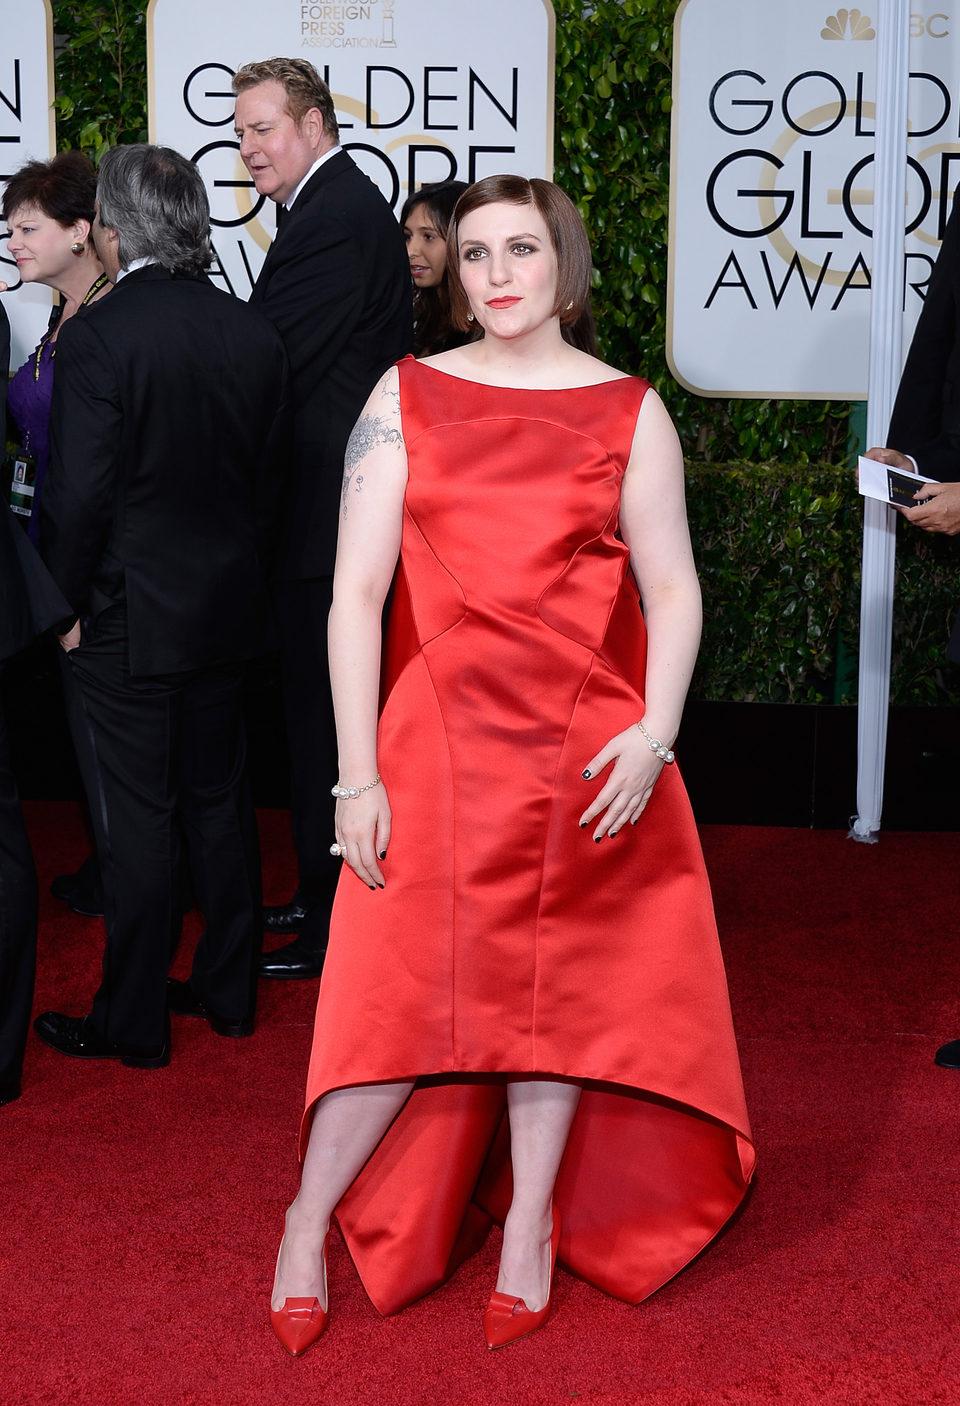 Lena Dunham at the Golden Globes 2015 red carpet